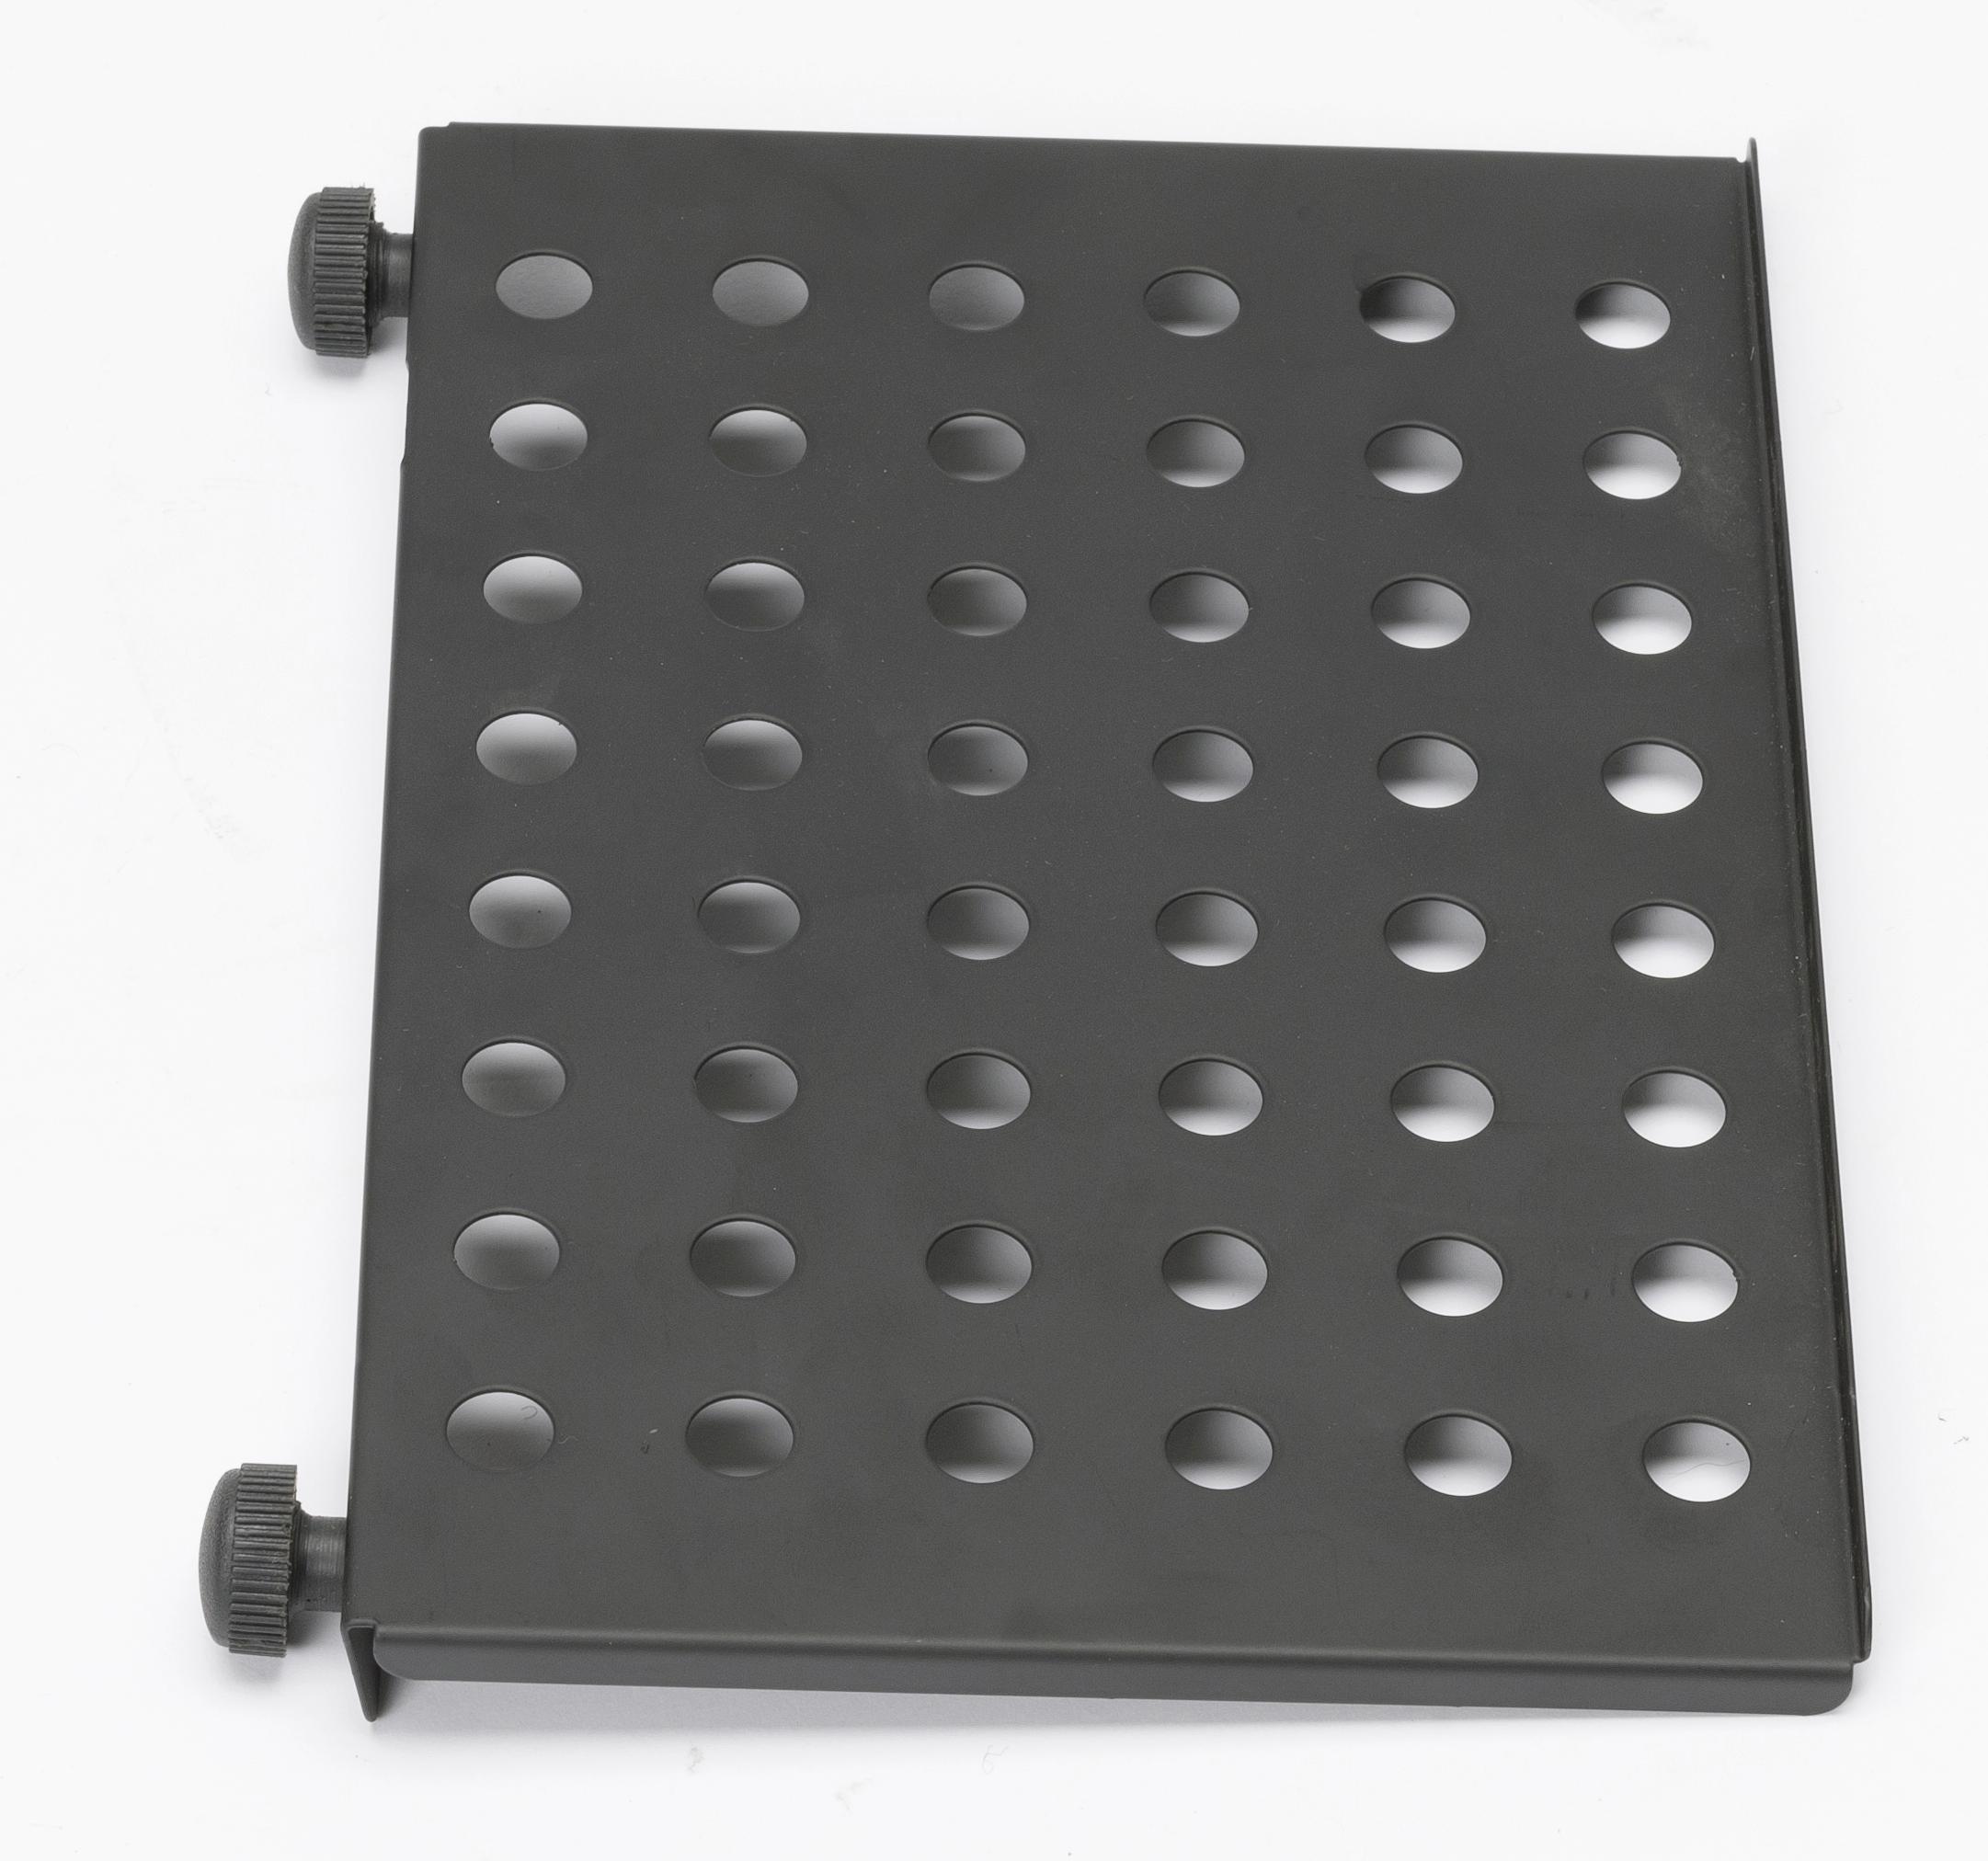 Magma-bags Laptop-Stand Traveler Tray (czarny)